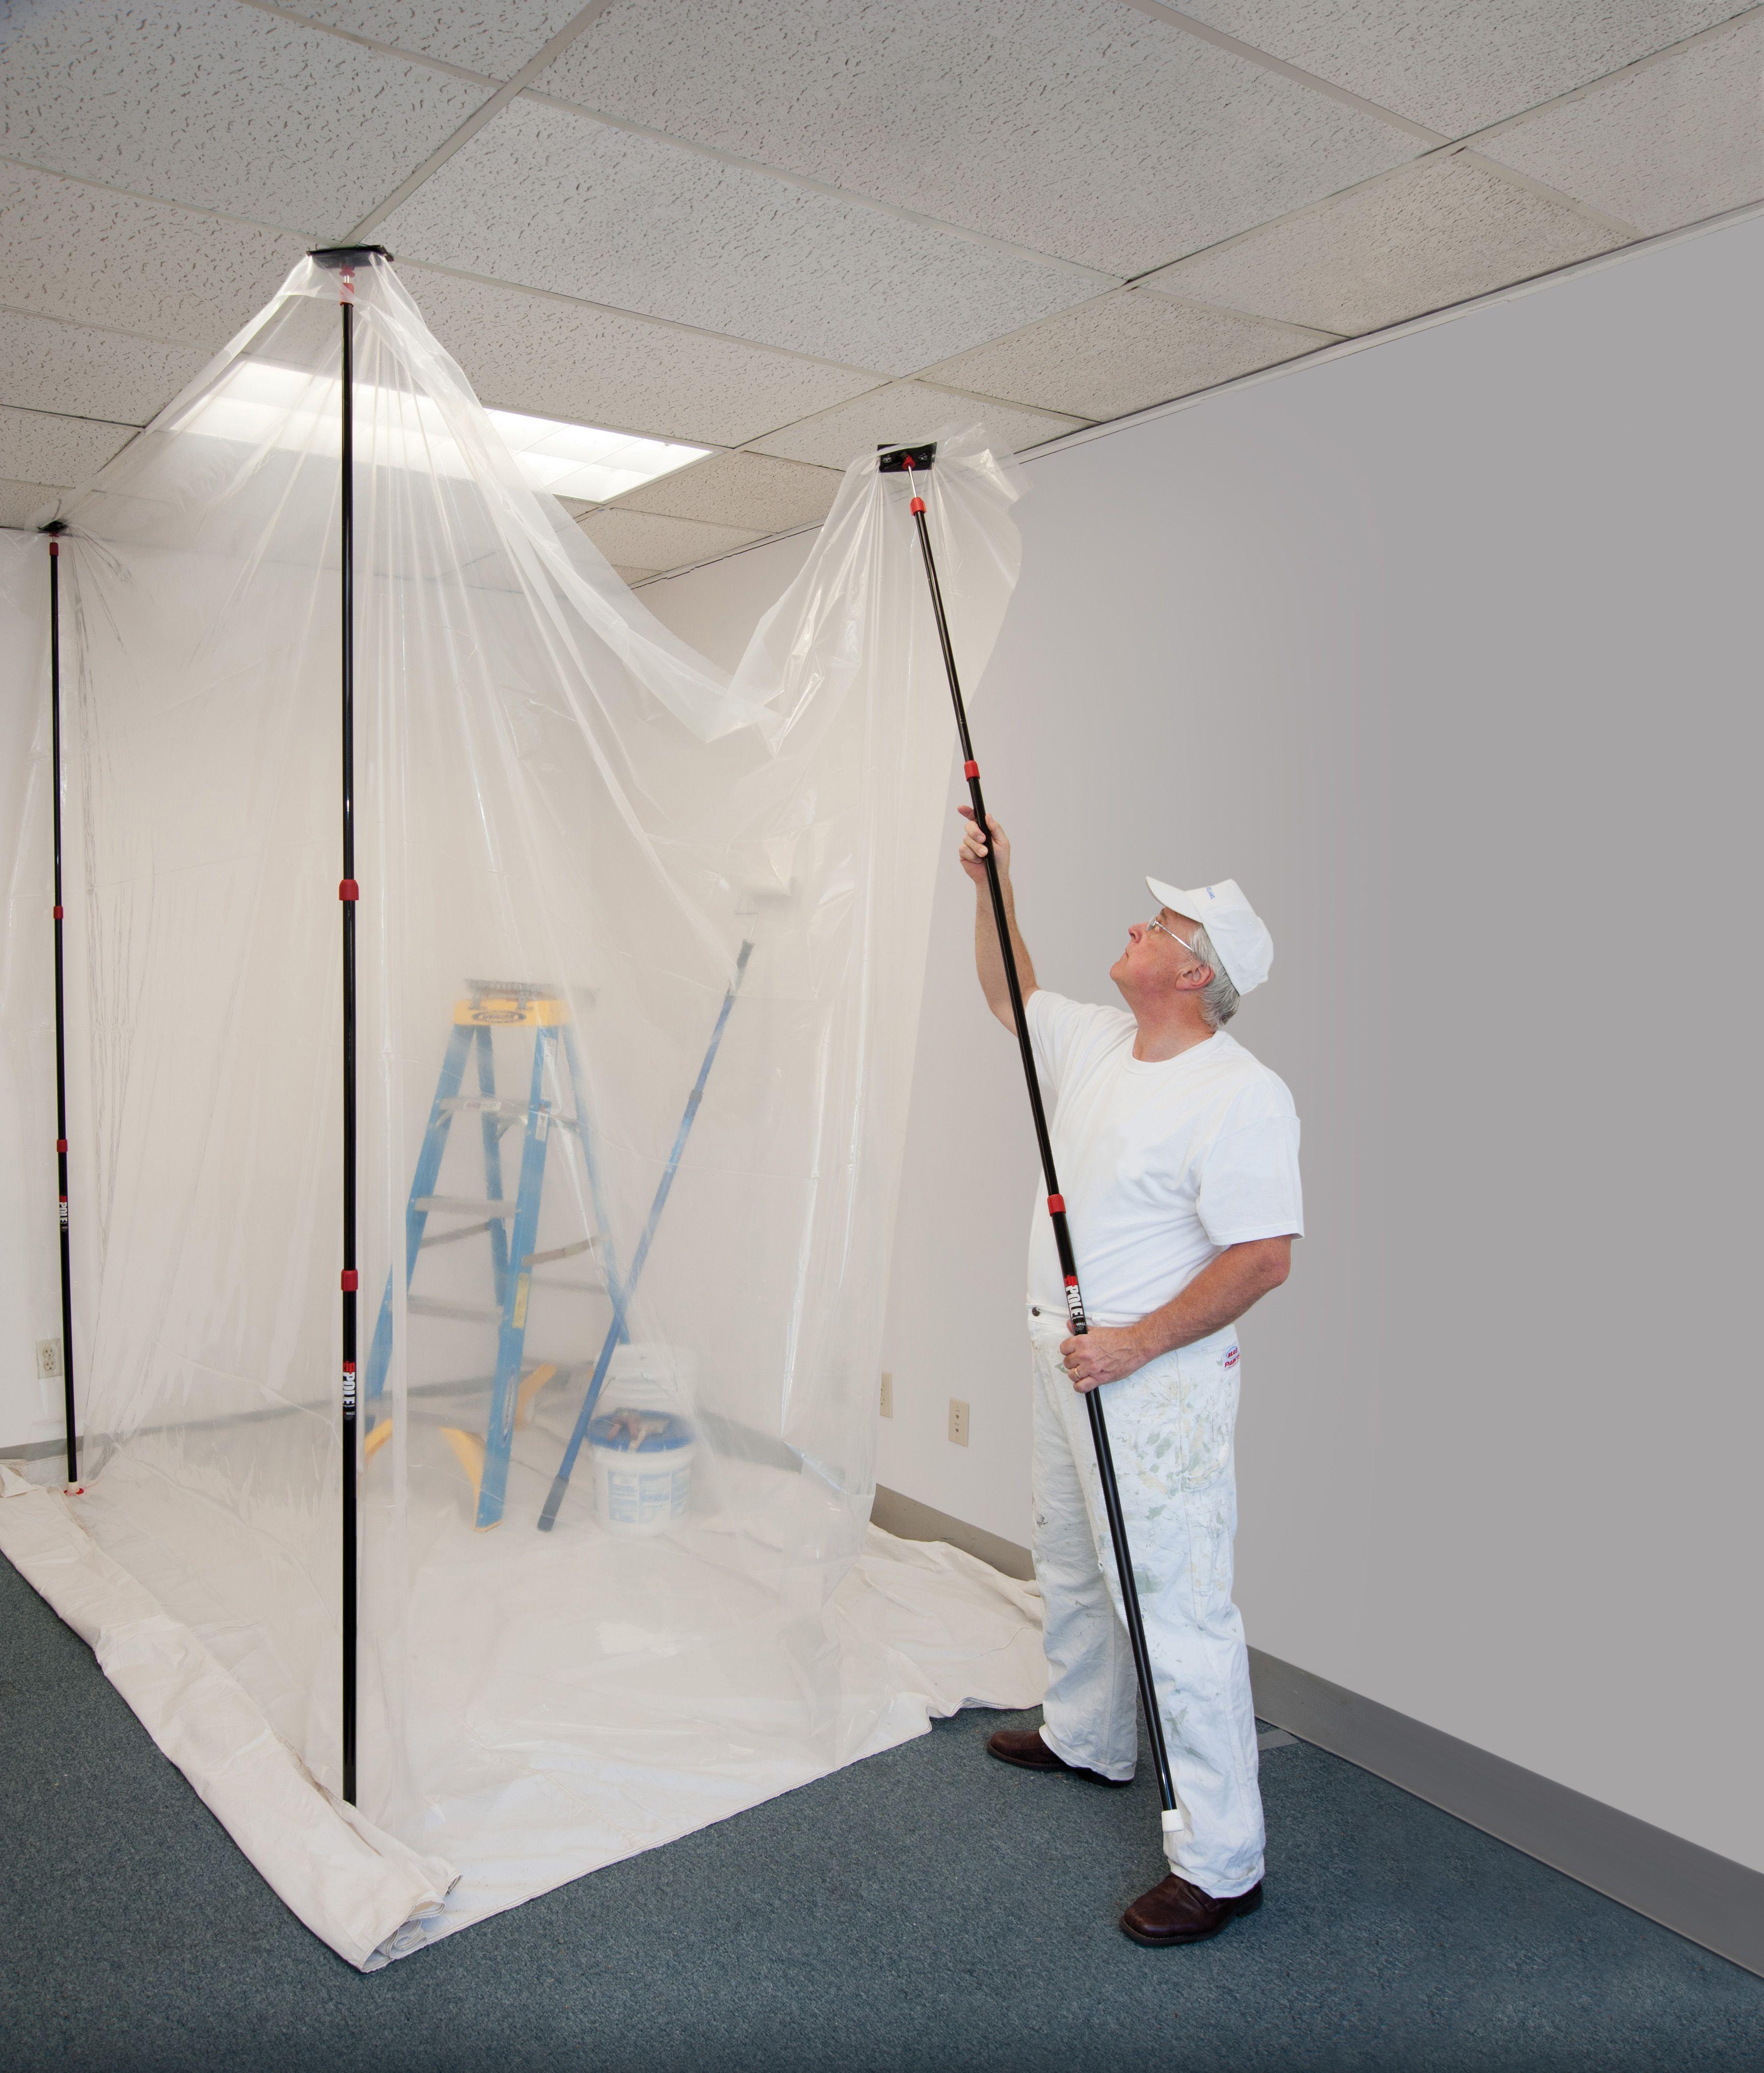 work zone paint spray instructions